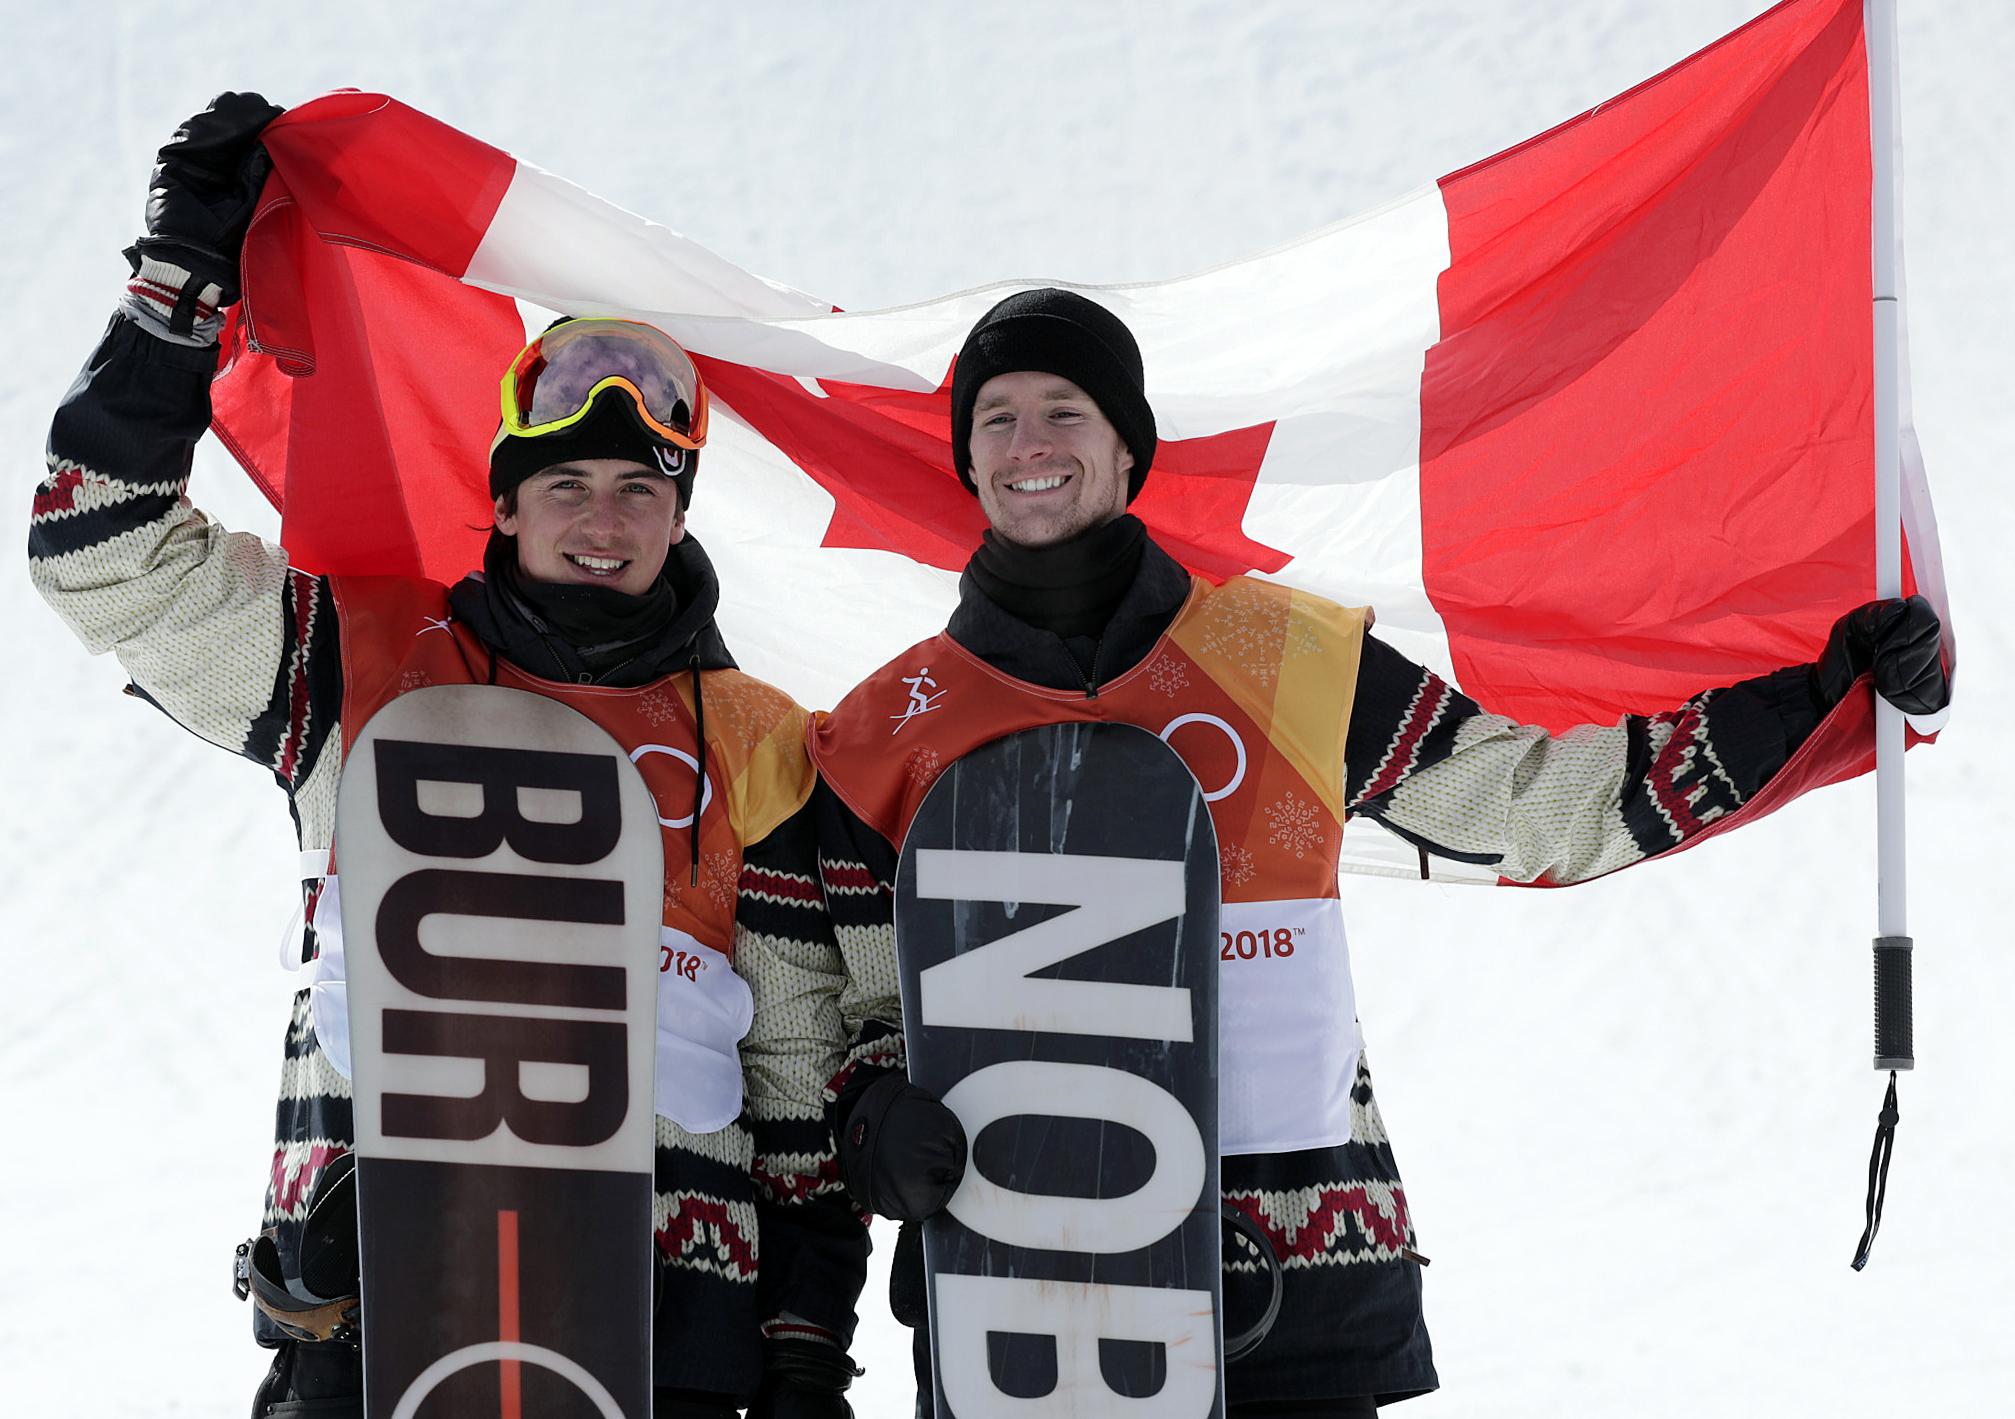 Team Canada PyeongChang 2018 Max Parrot Mark McMorris podium